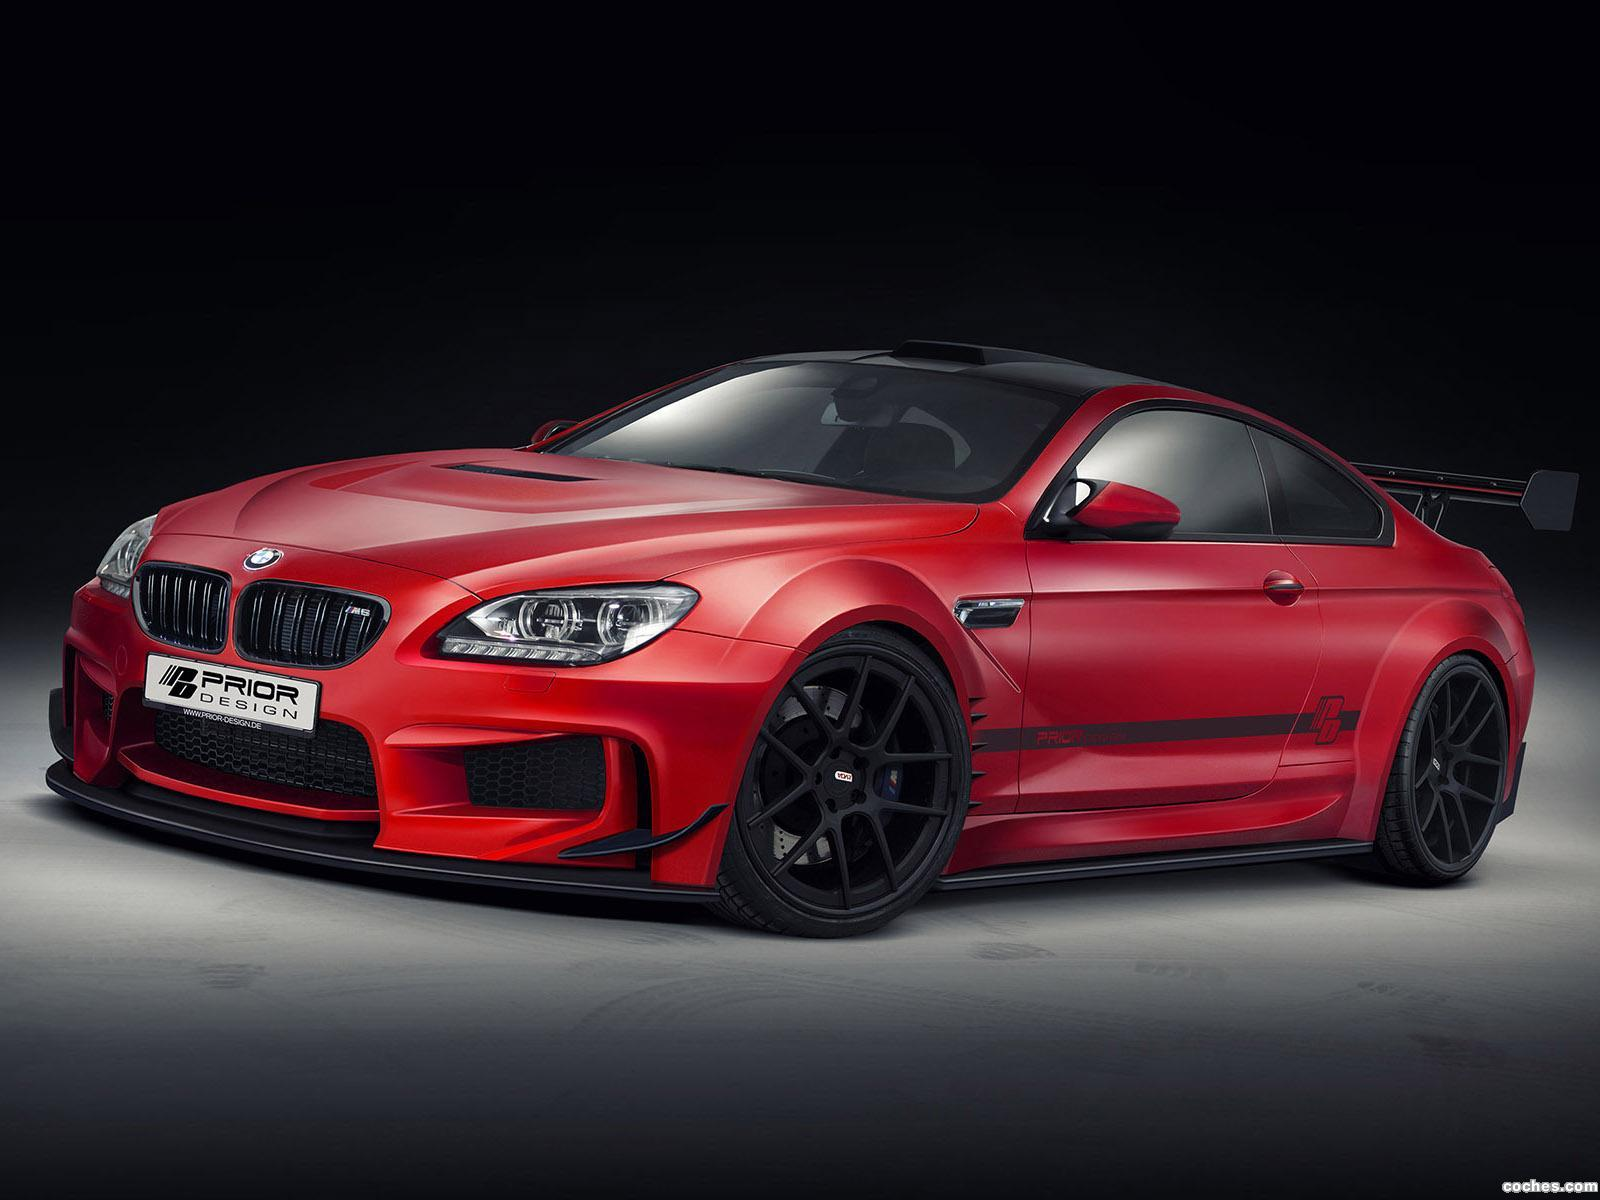 Foto 0 de Prior Design BMW M6 F12 2013